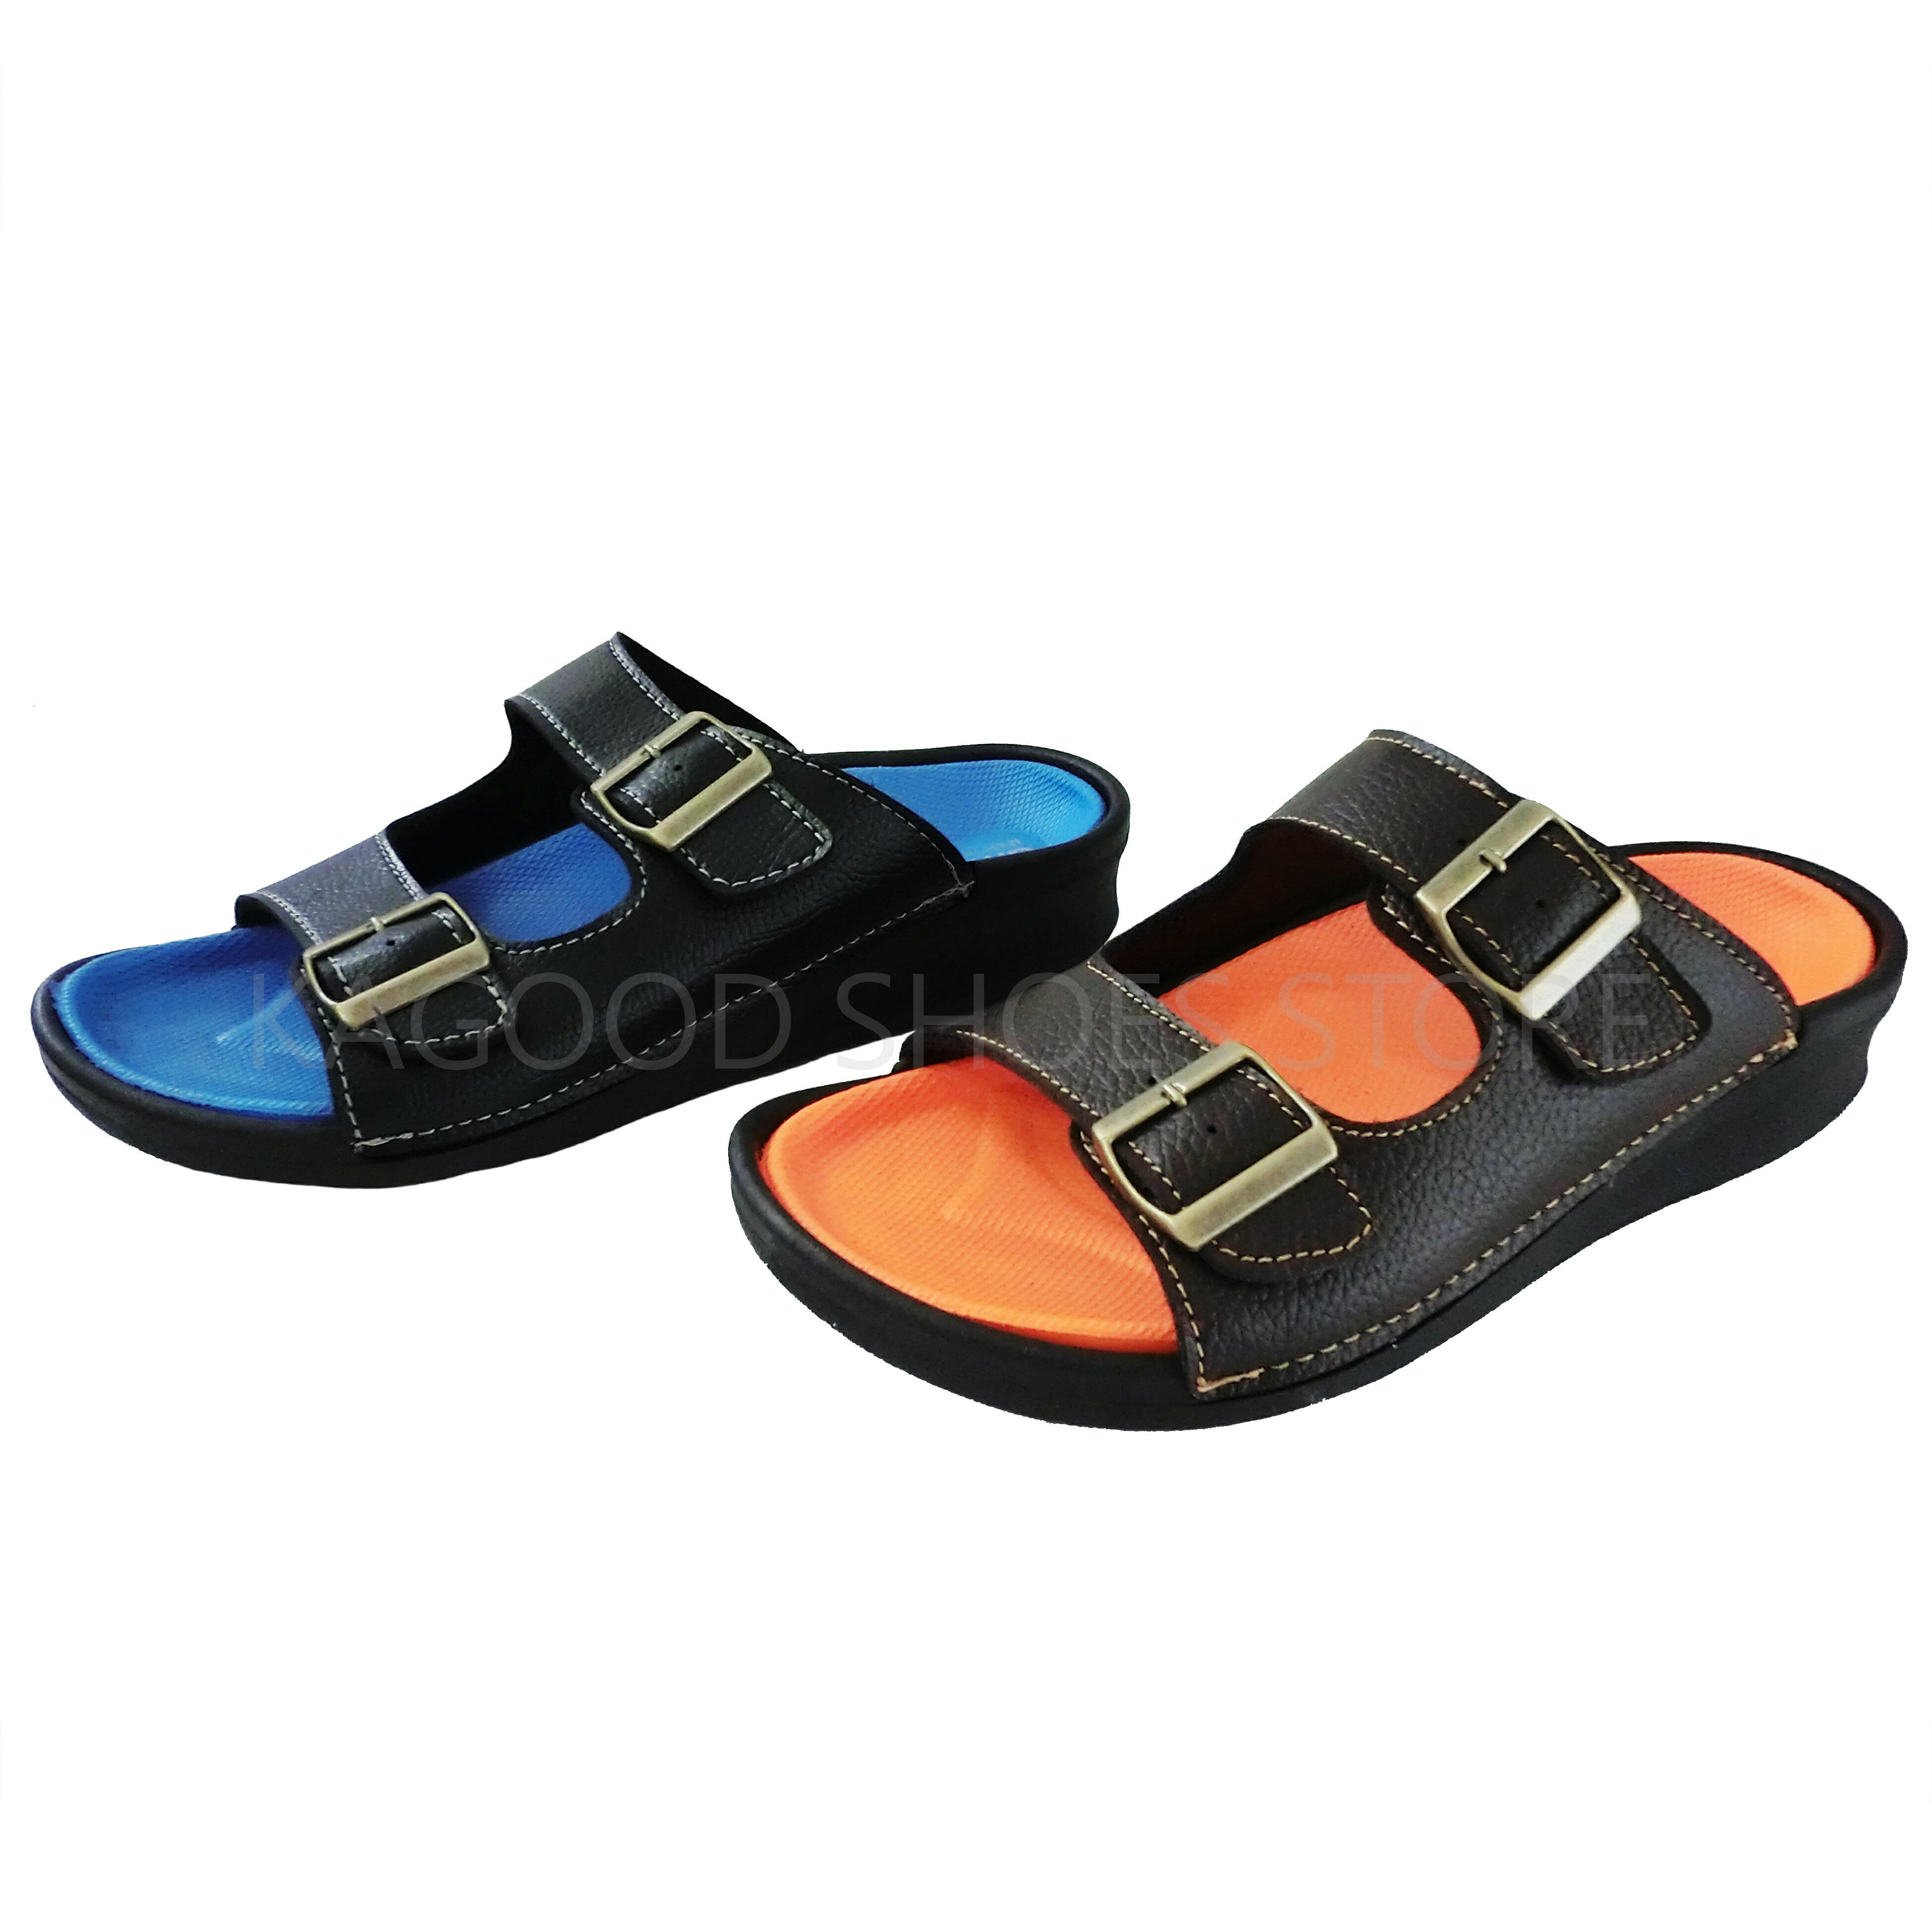 Arriba 61-427 拖鞋 便鞋 咖啡色 / 黑色款 男鞋